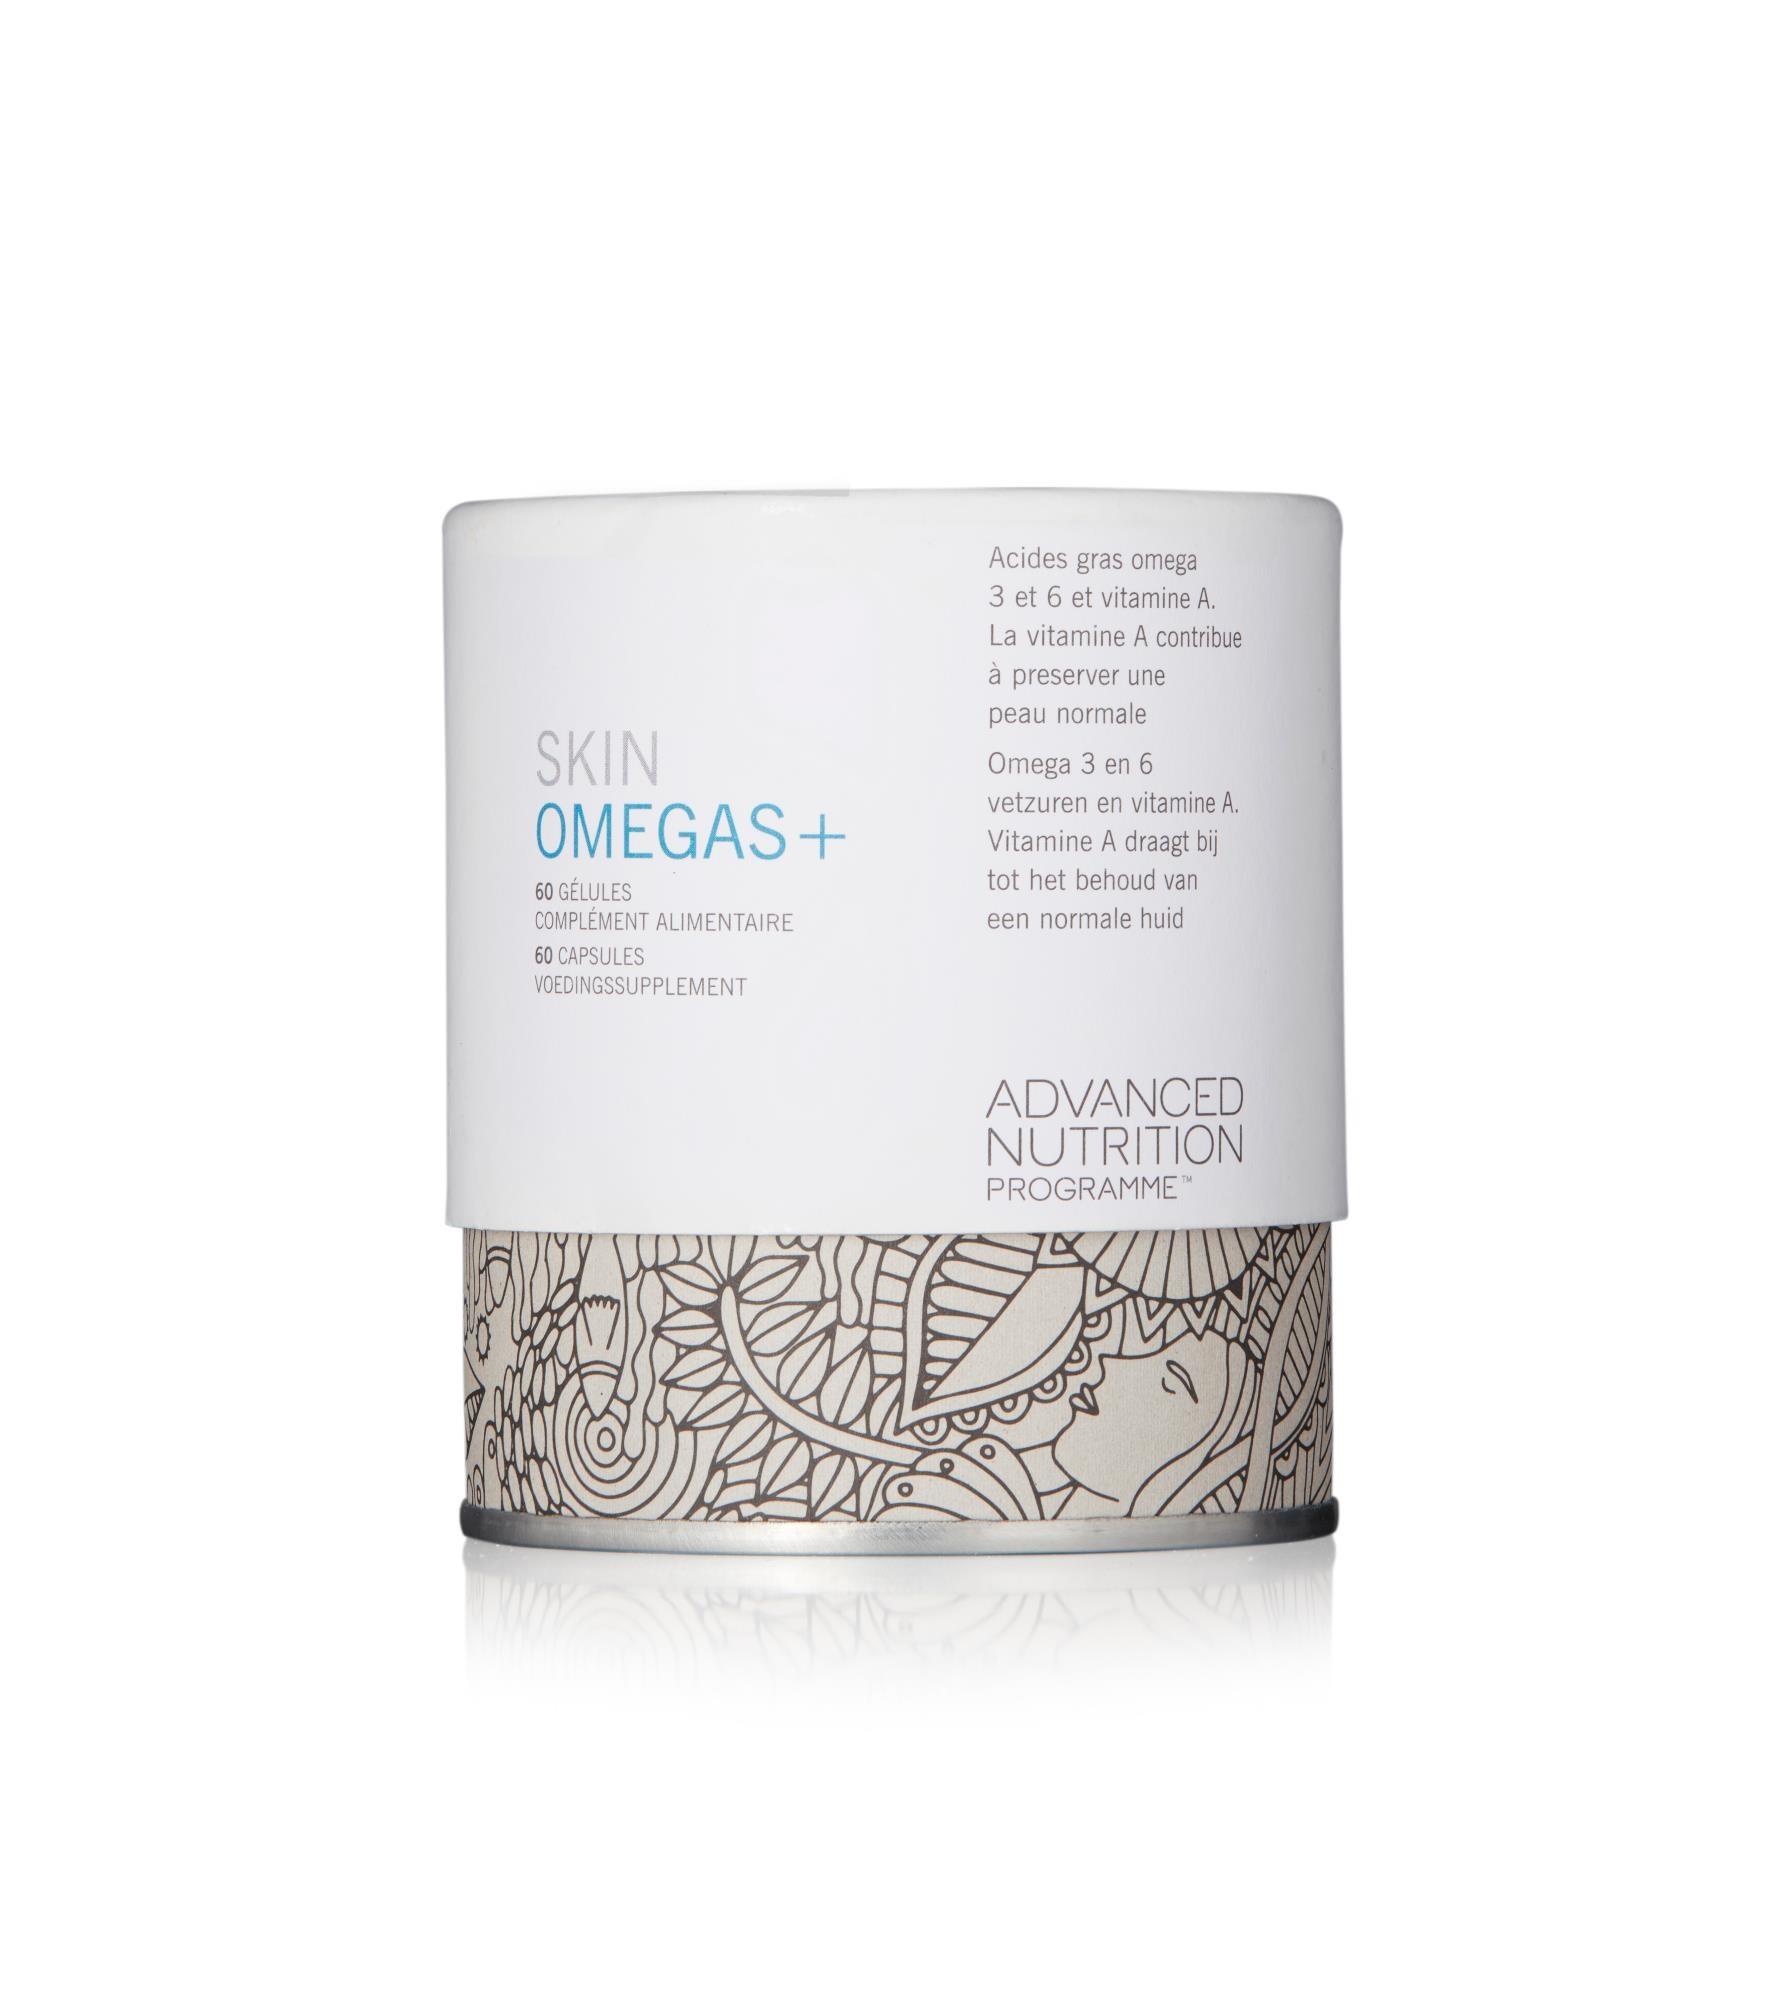 Skin Omegas+ - 60 caps-1